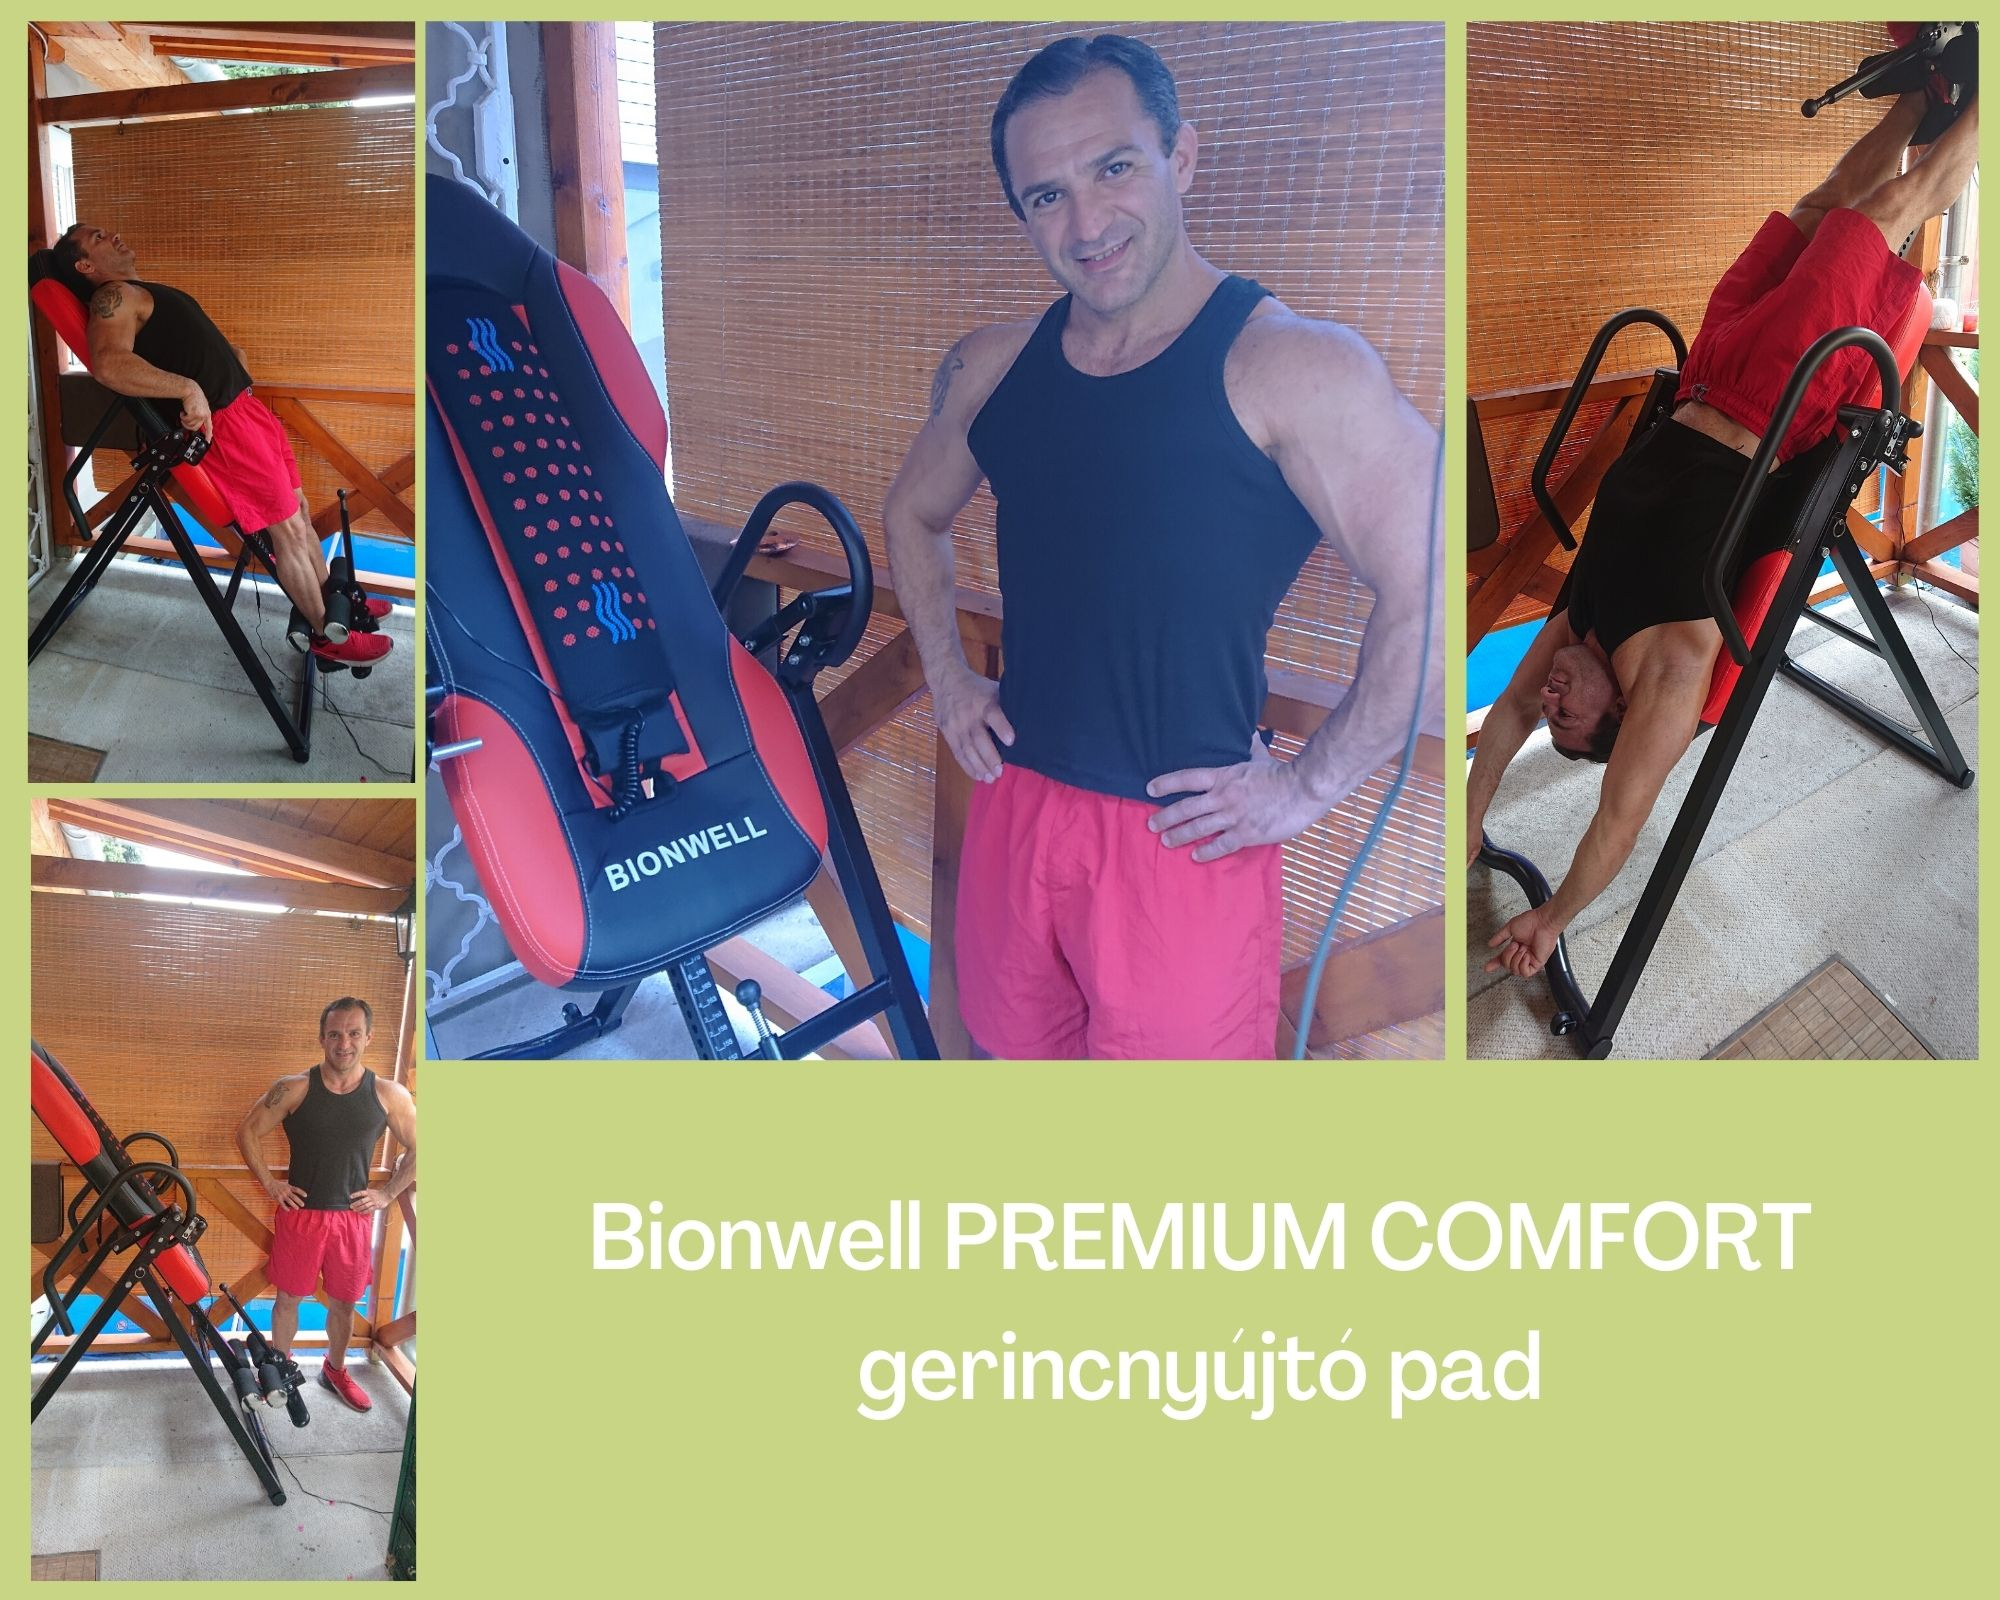 bionwell-12tl-premium-comfort-gerincnyujto-pad-hasznalati-kepek